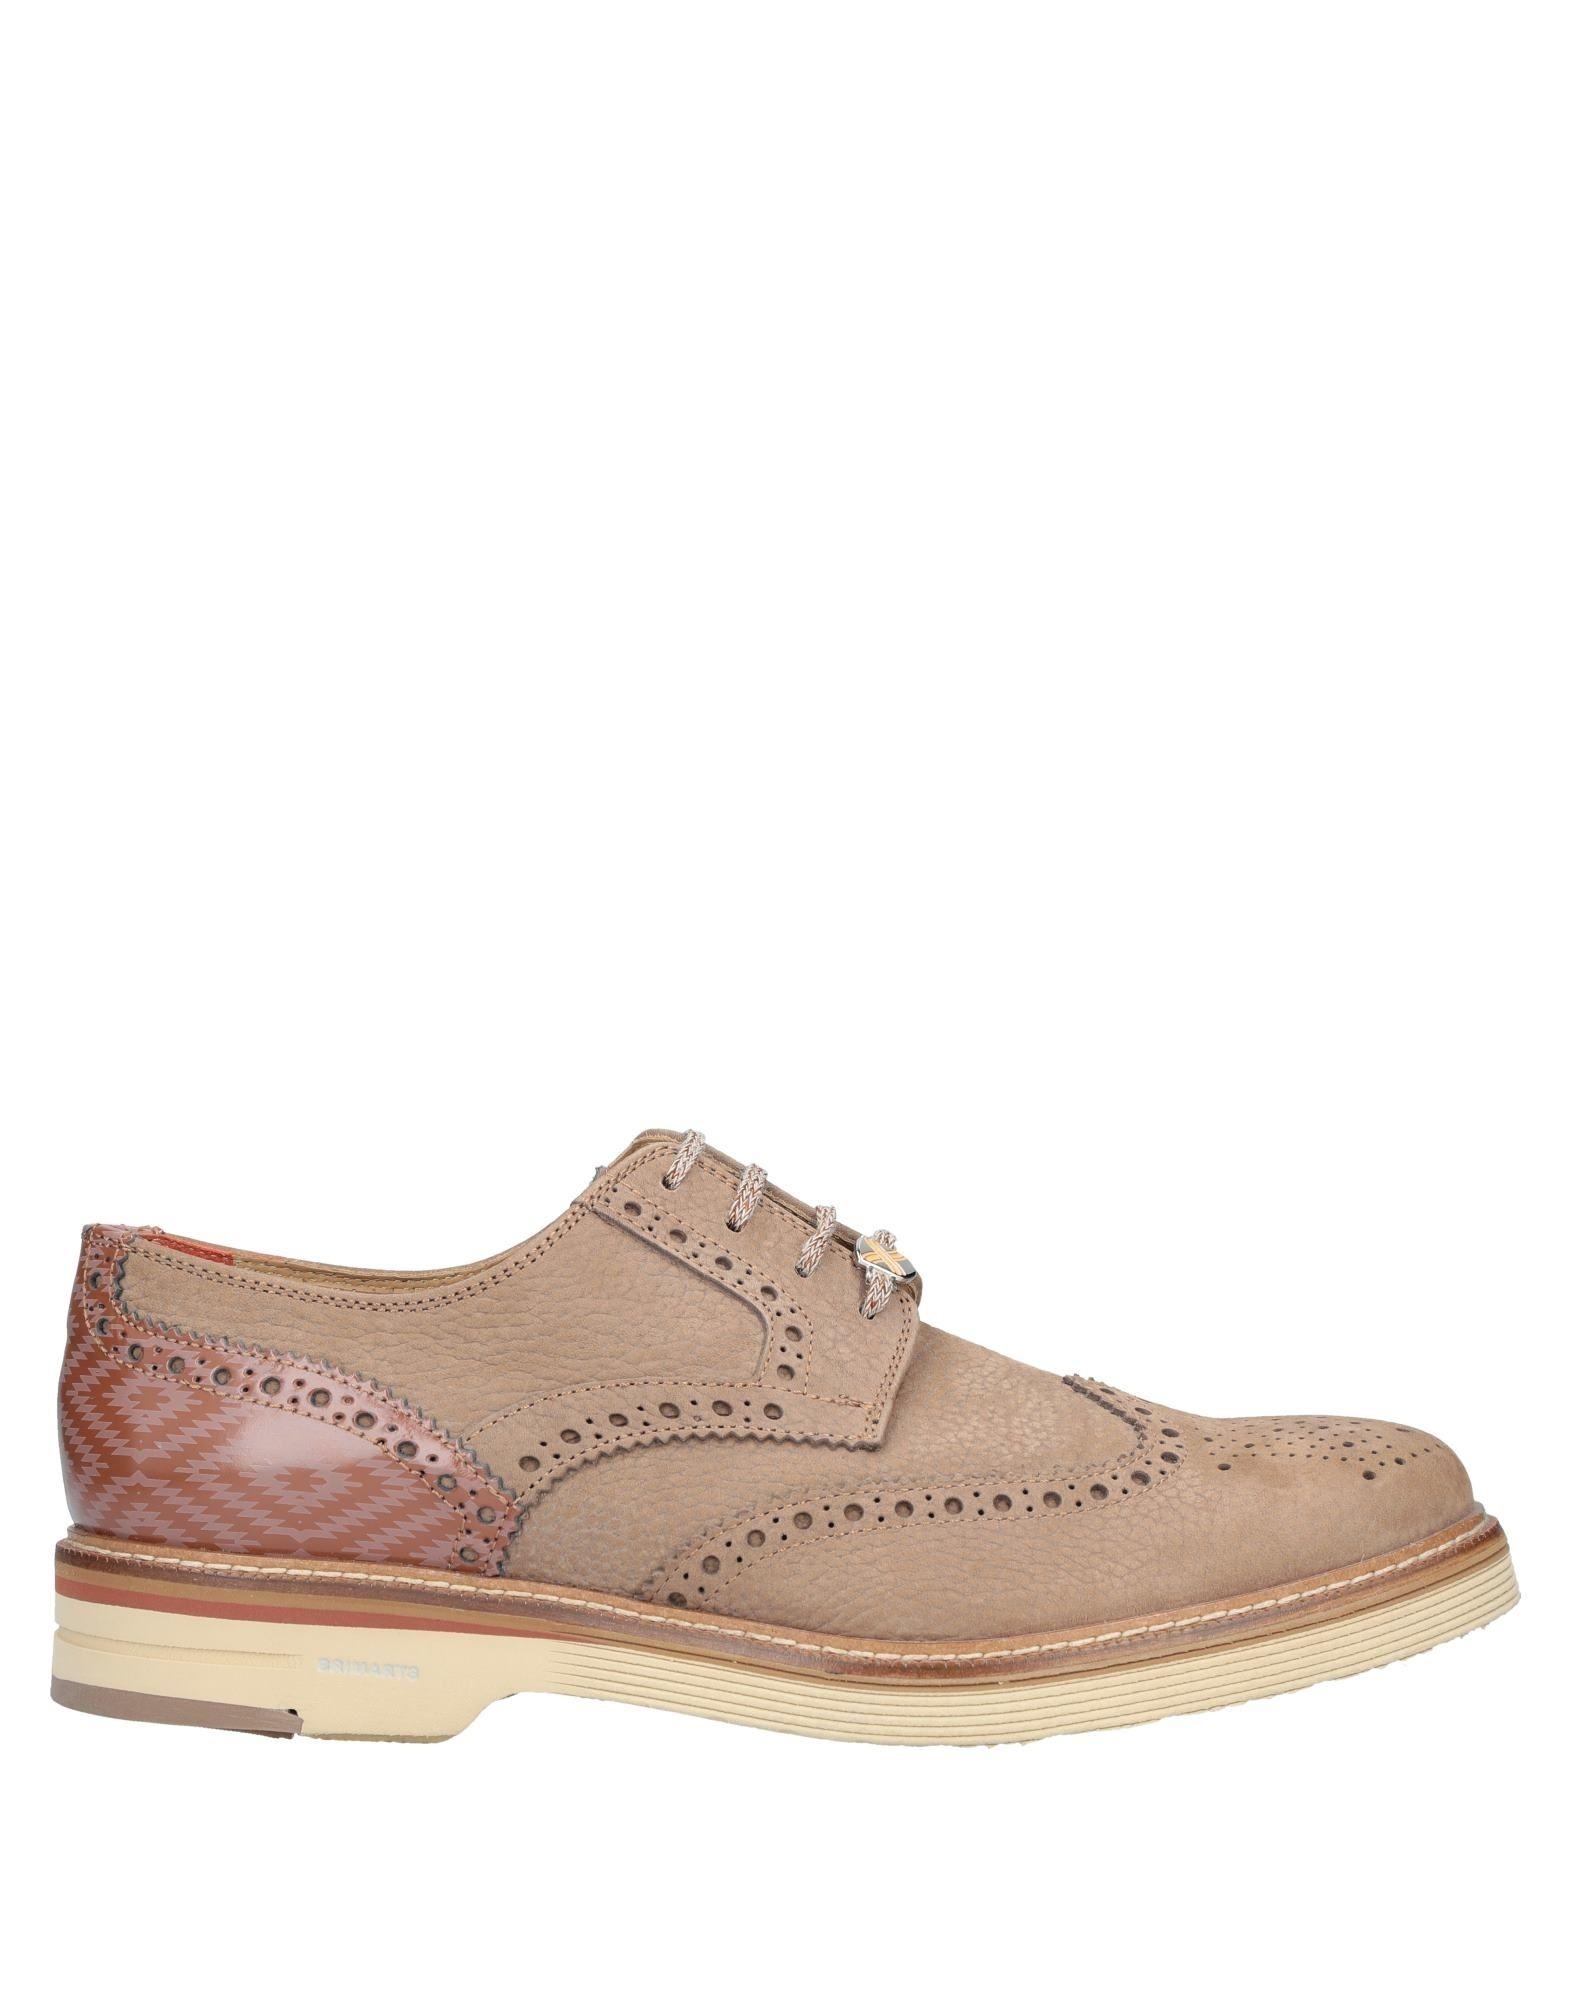 Rabatt echte Schuhe Brimarts Schnürschuhe Herren 11528030FX  11528030FX Herren 8eac07